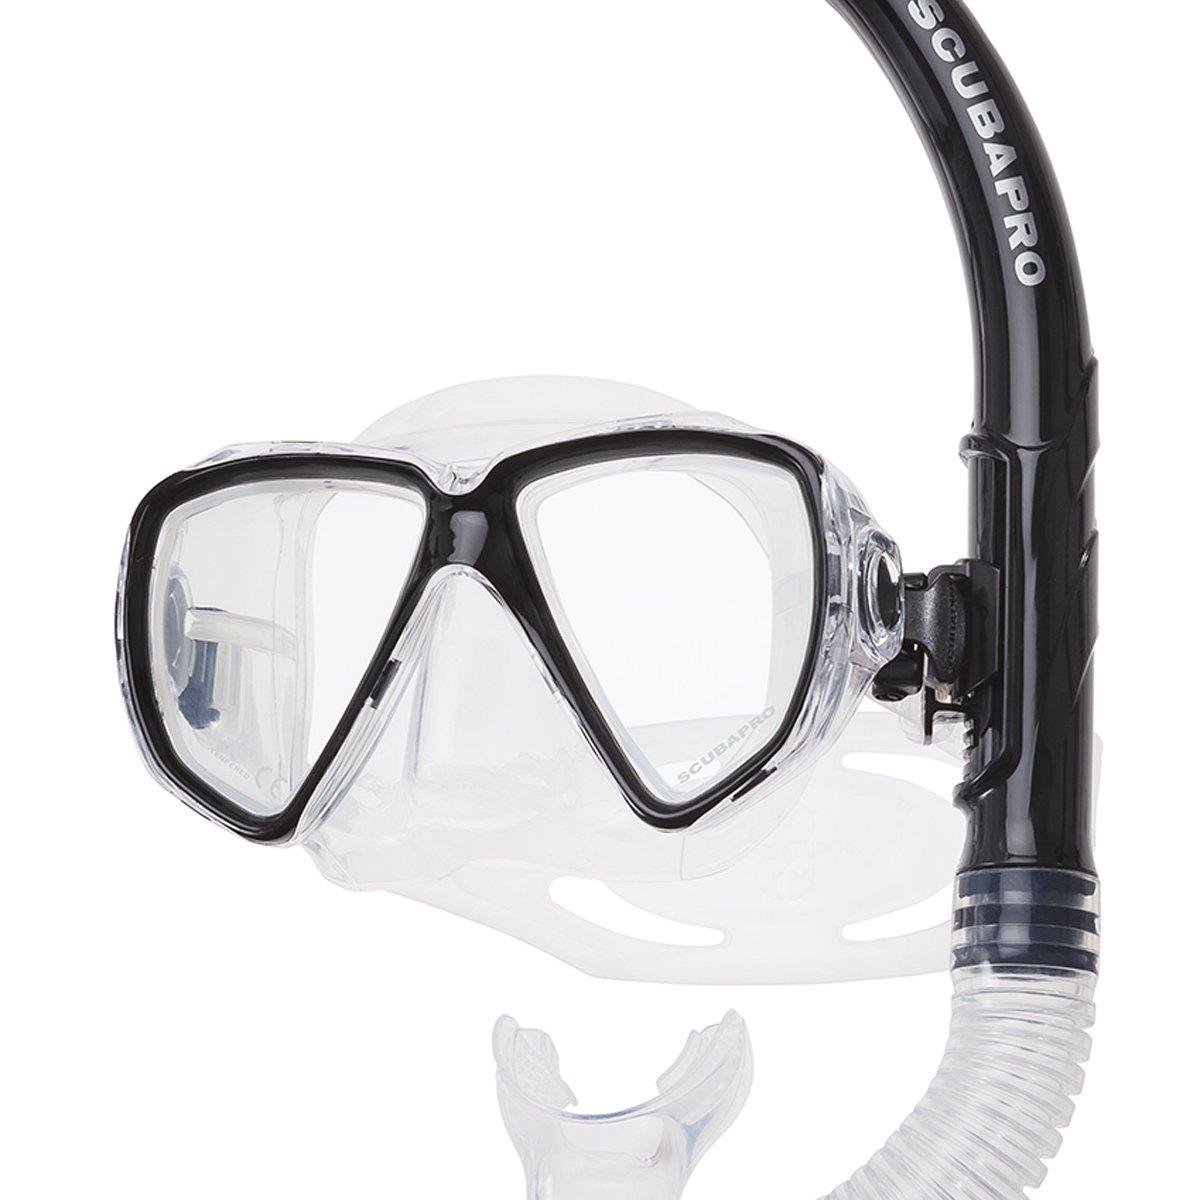 Currents Adult Mask / Snorkel Combo